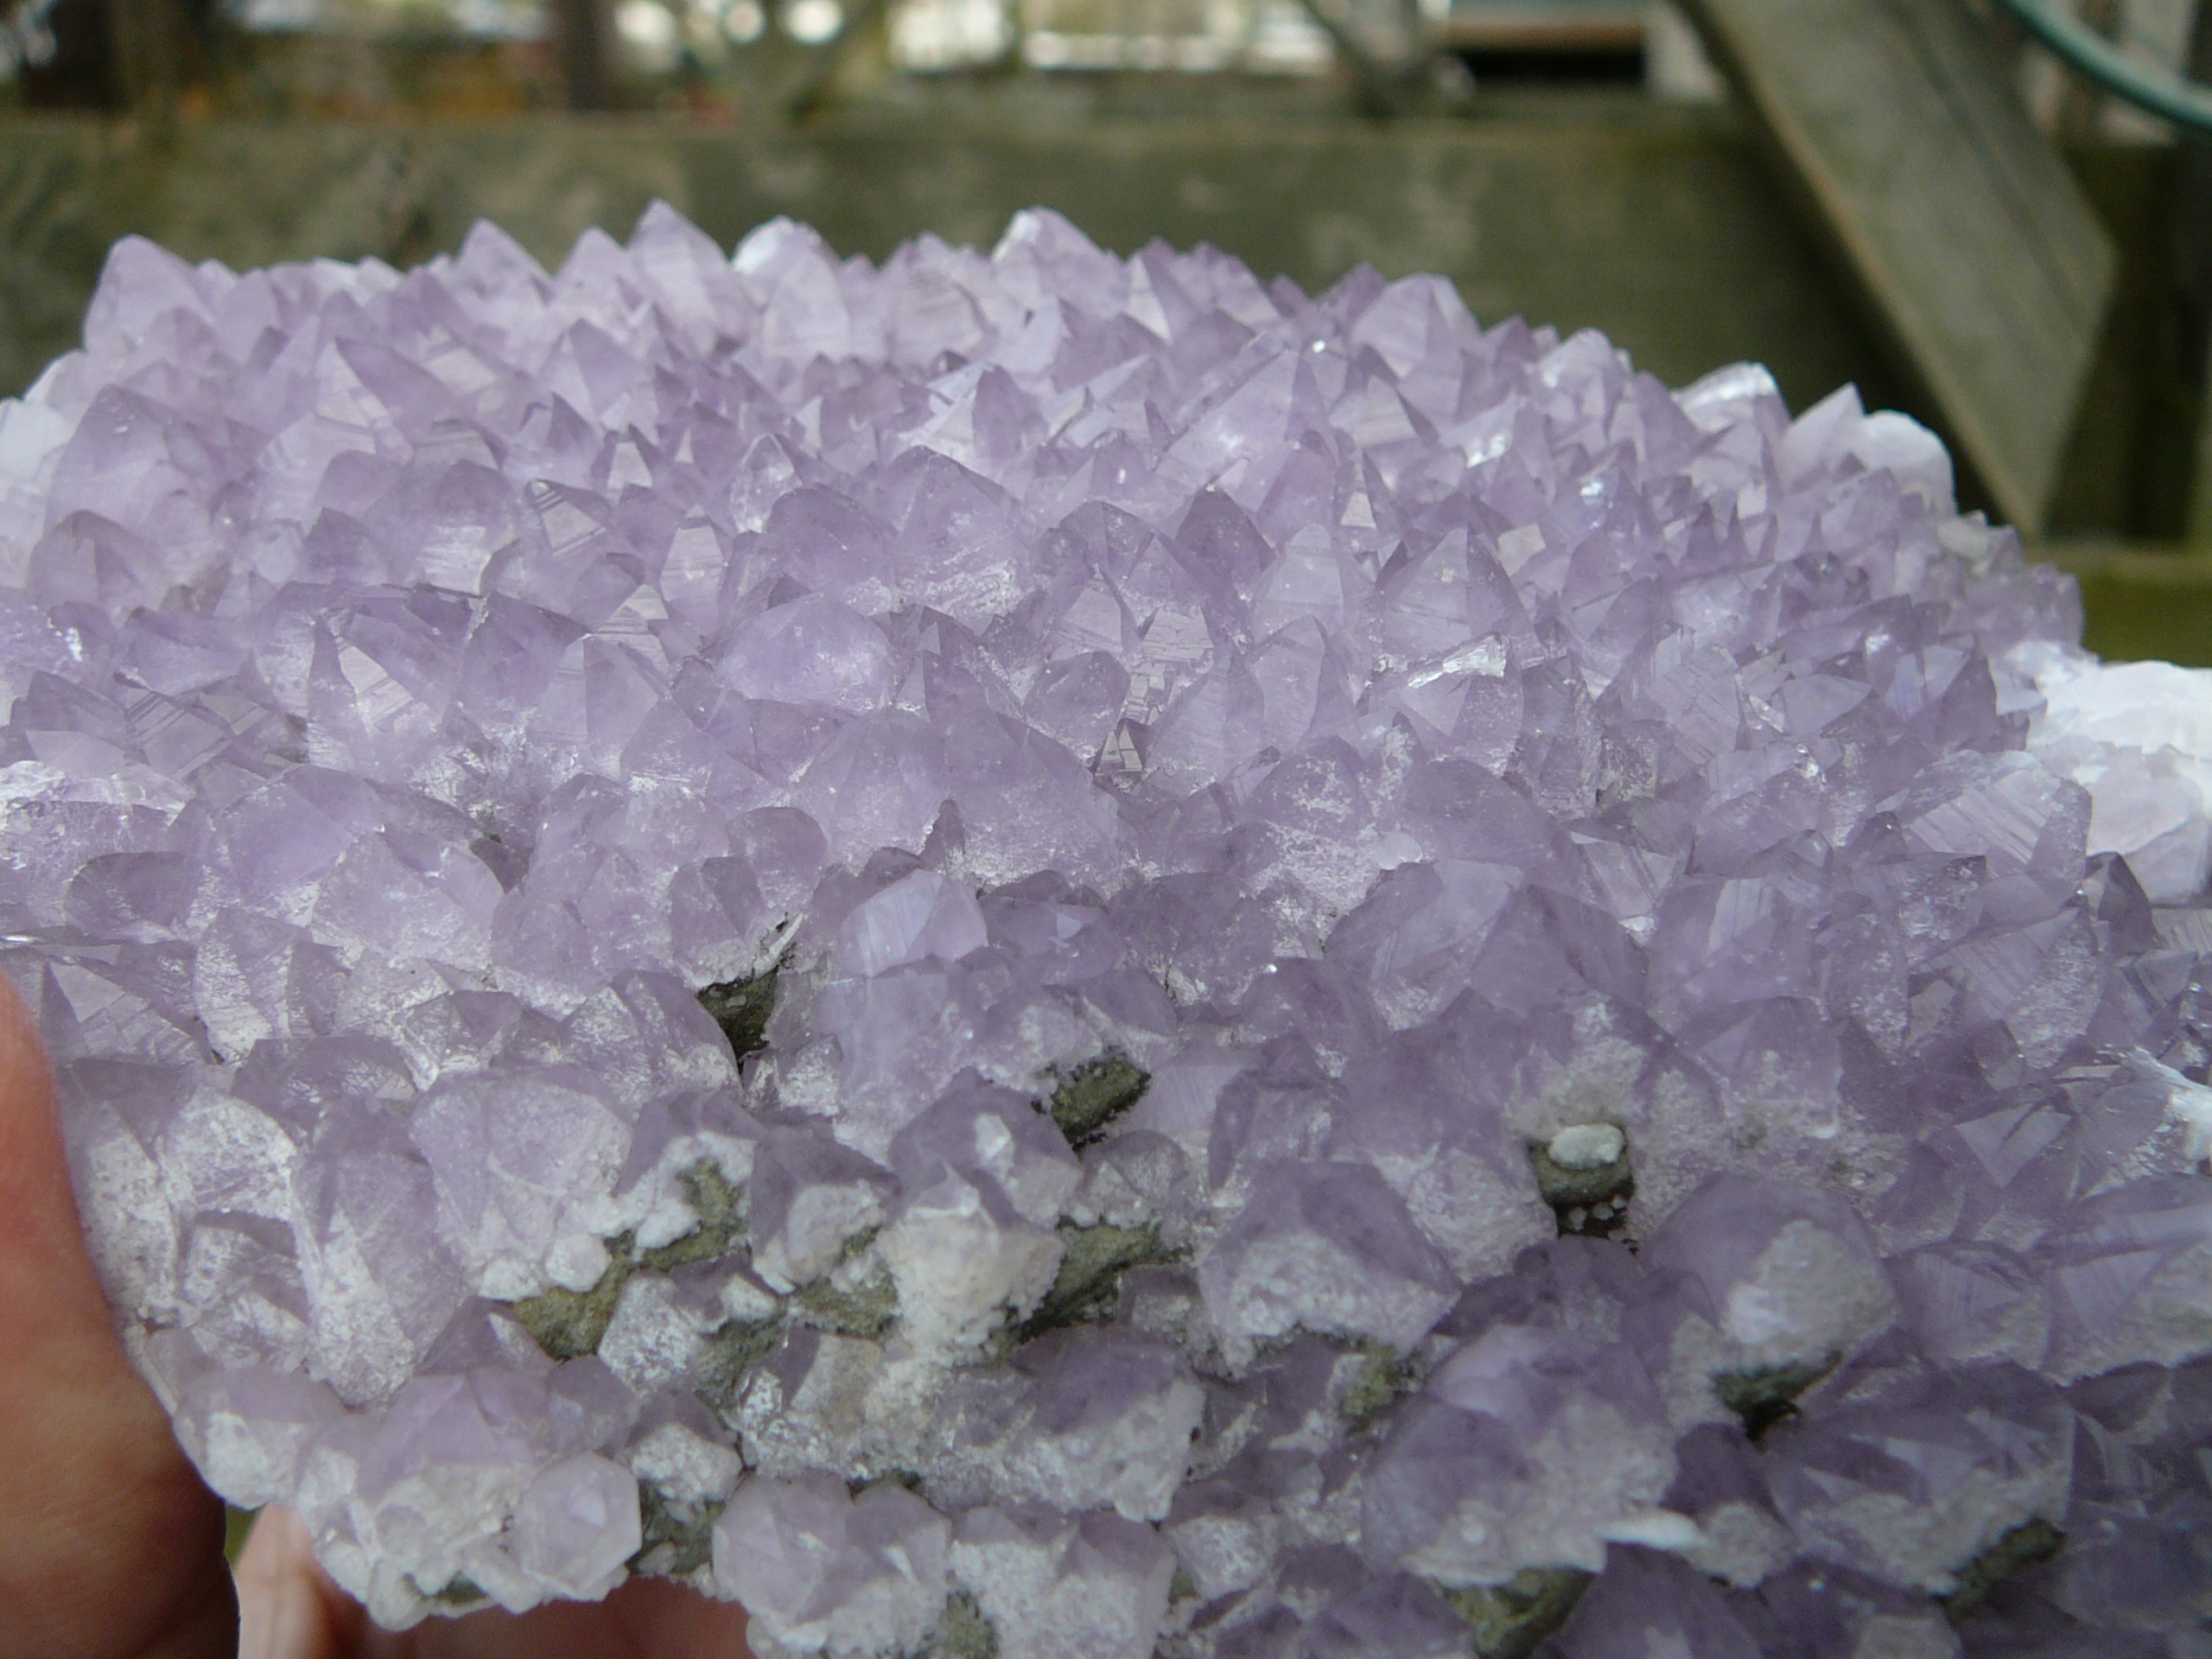 Quartz (var. Amethyst), chalcopyrite